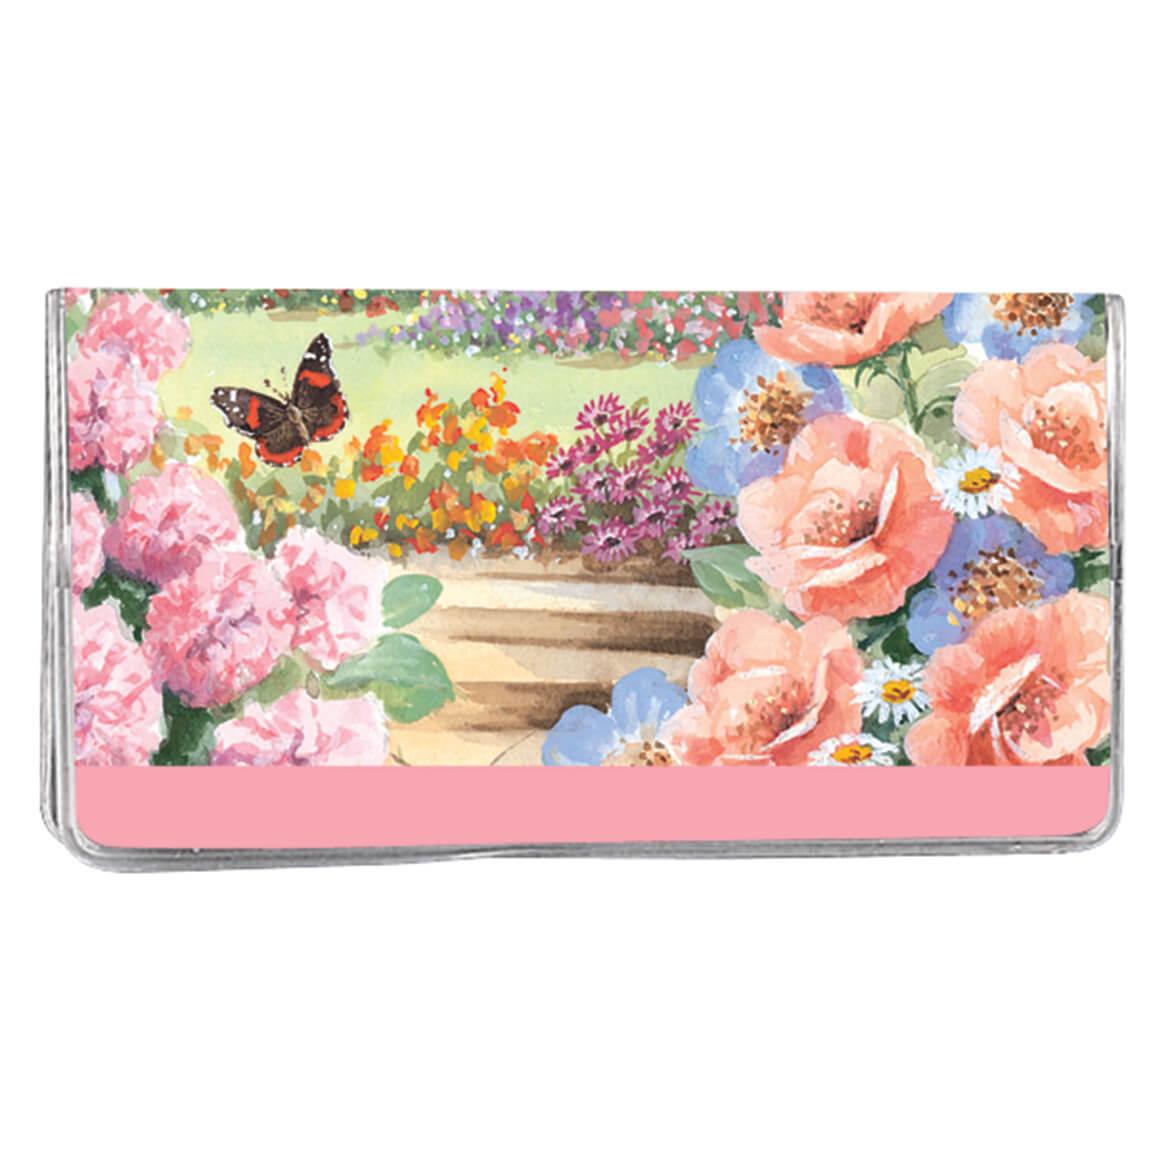 Butterfly Garden Two Year Planner, 2021-2022 - Pocket in Retail 4 5 4 Calendar 2022